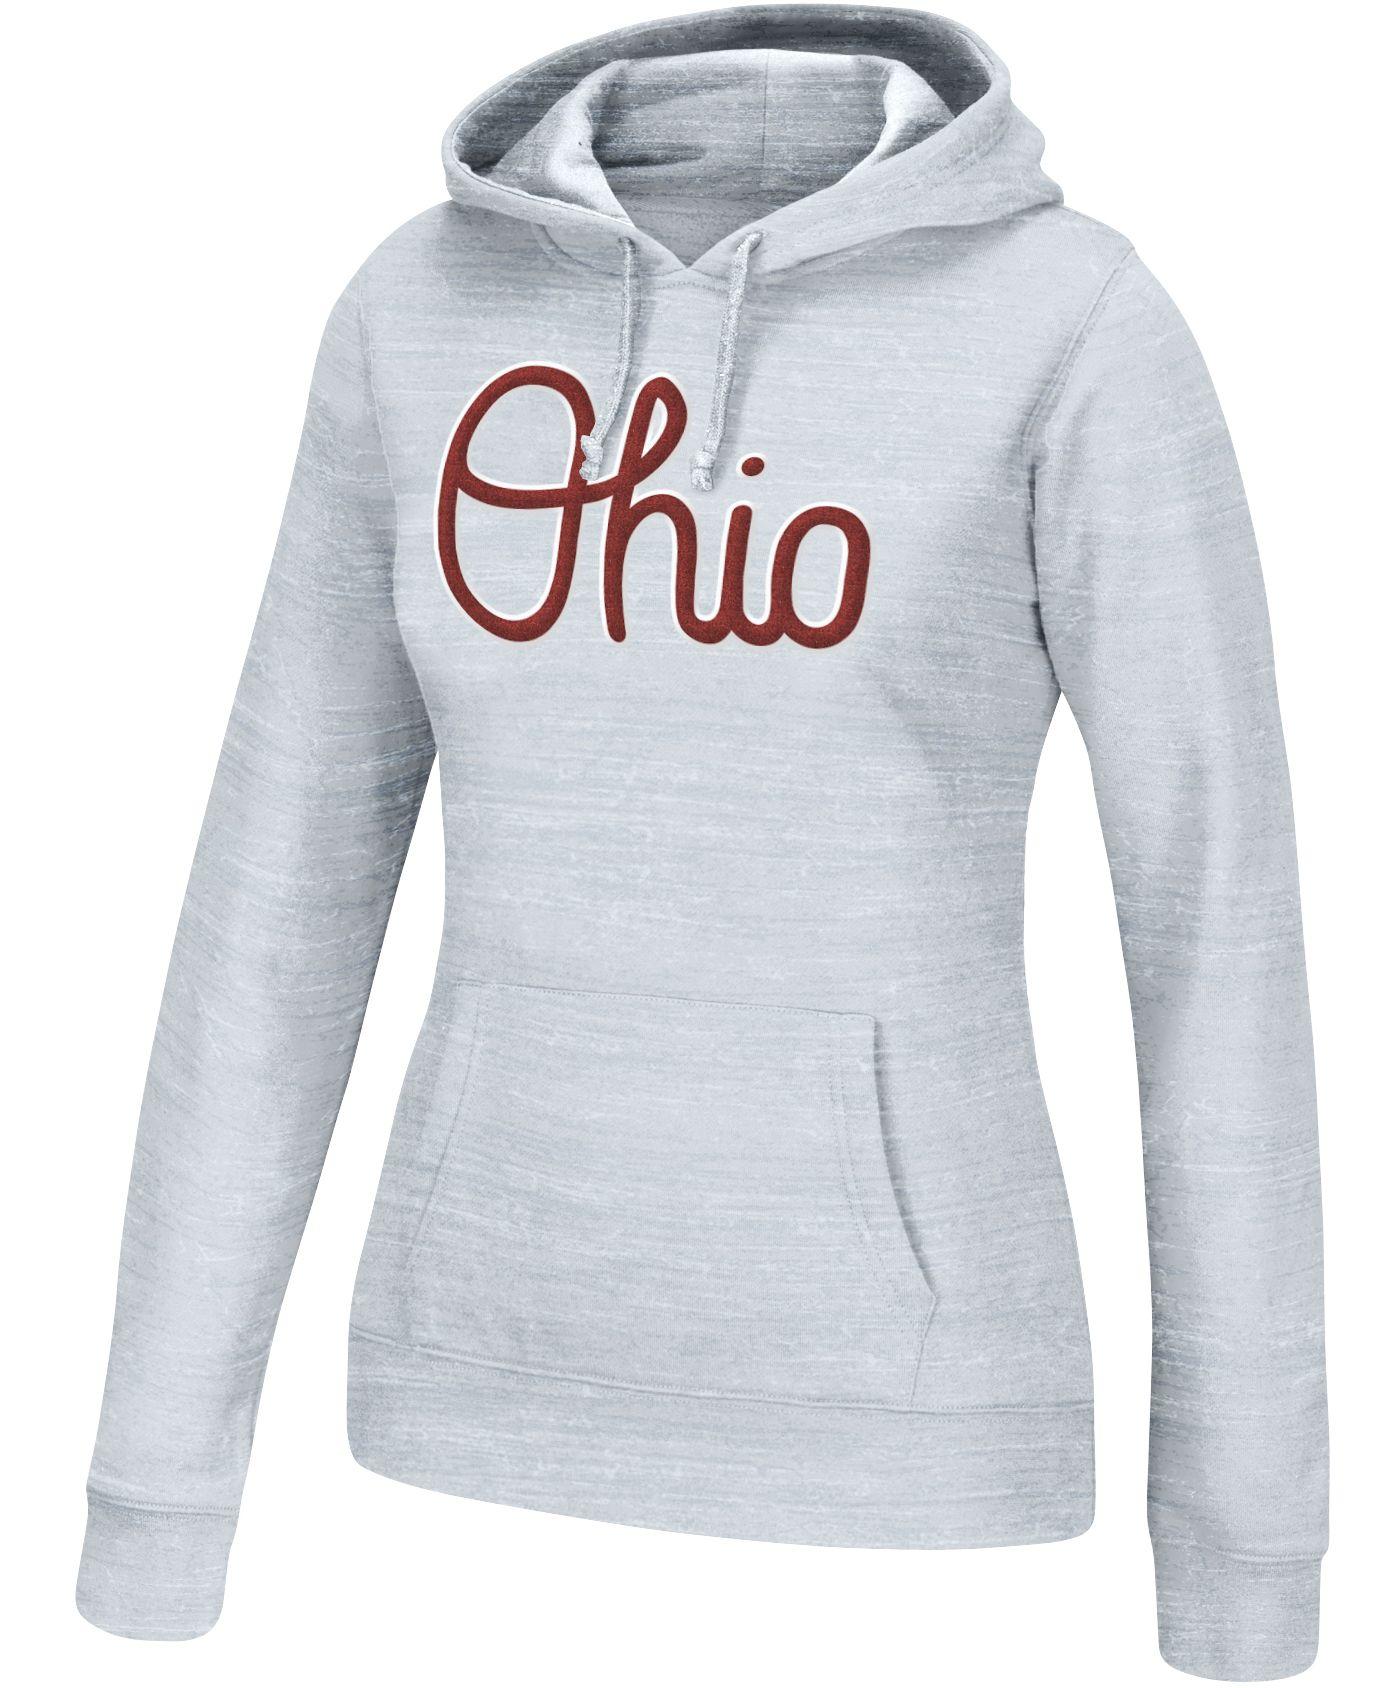 Scarlet & Gray Women's Ohio State Buckeyes Gray Script Hoodie